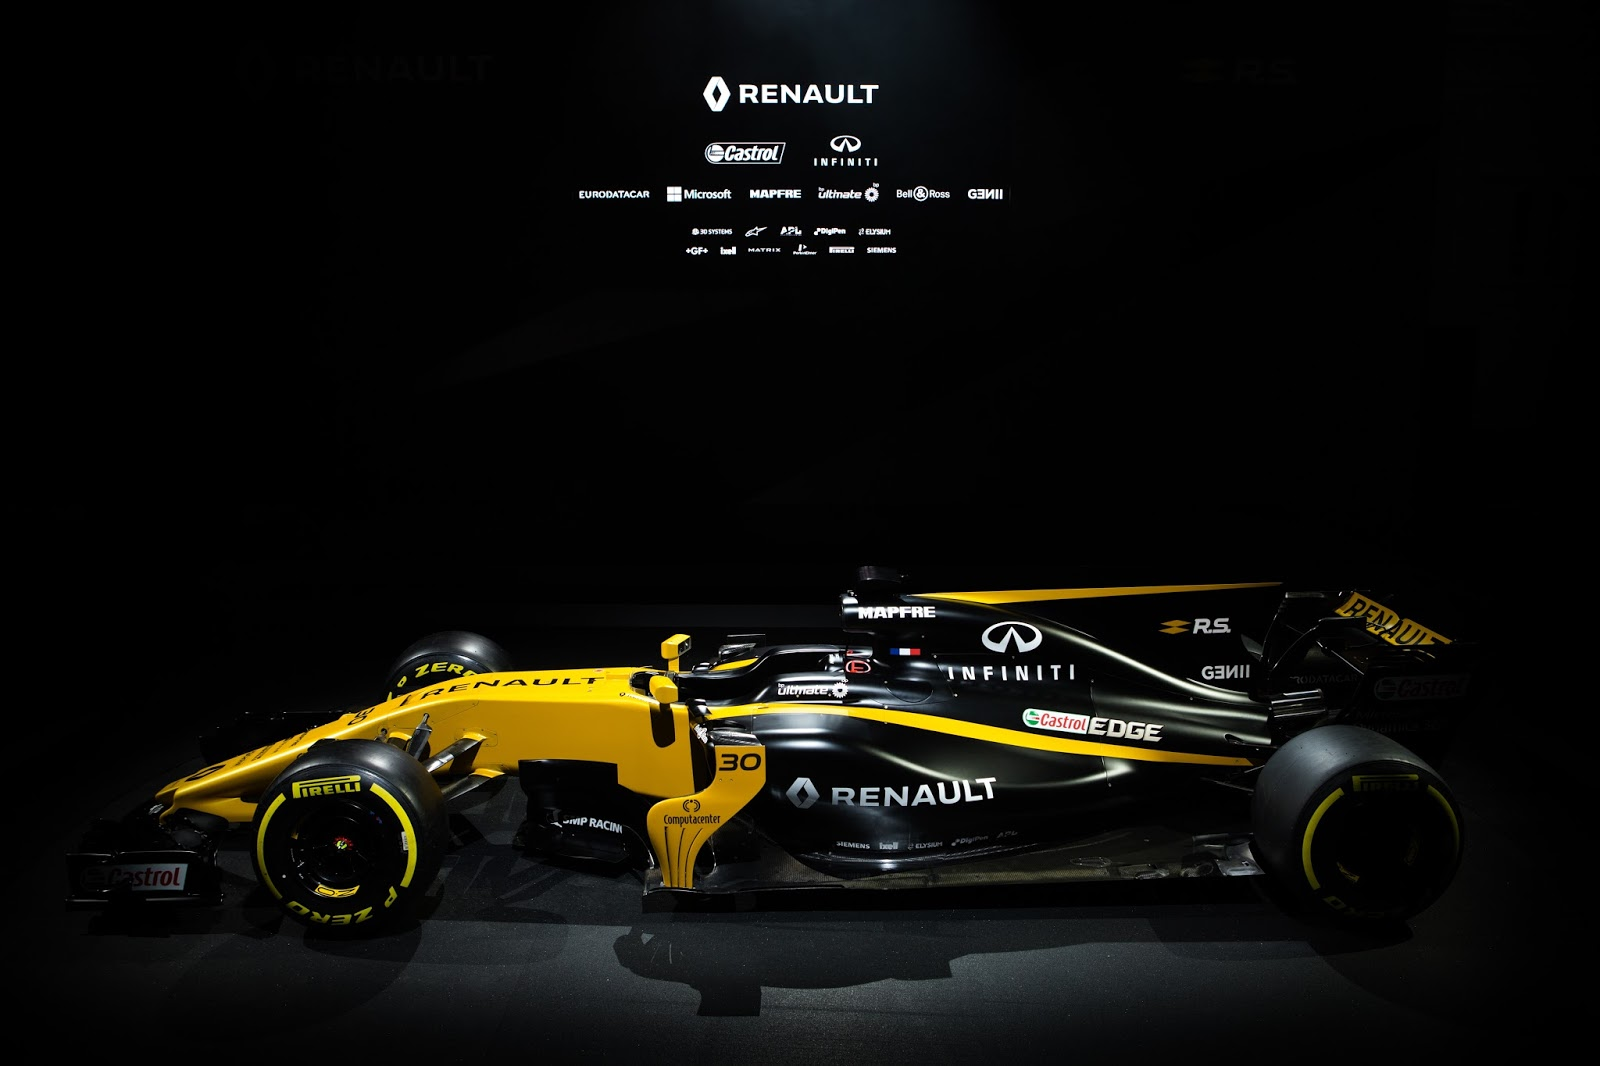 210217 RL 010 Η Renault Sport παρουσίασε το καινούργιο της μονοθέσιο, την R.S.17 F1, Formula 1, Renault, Renault Sport Formula 1 Team, videos